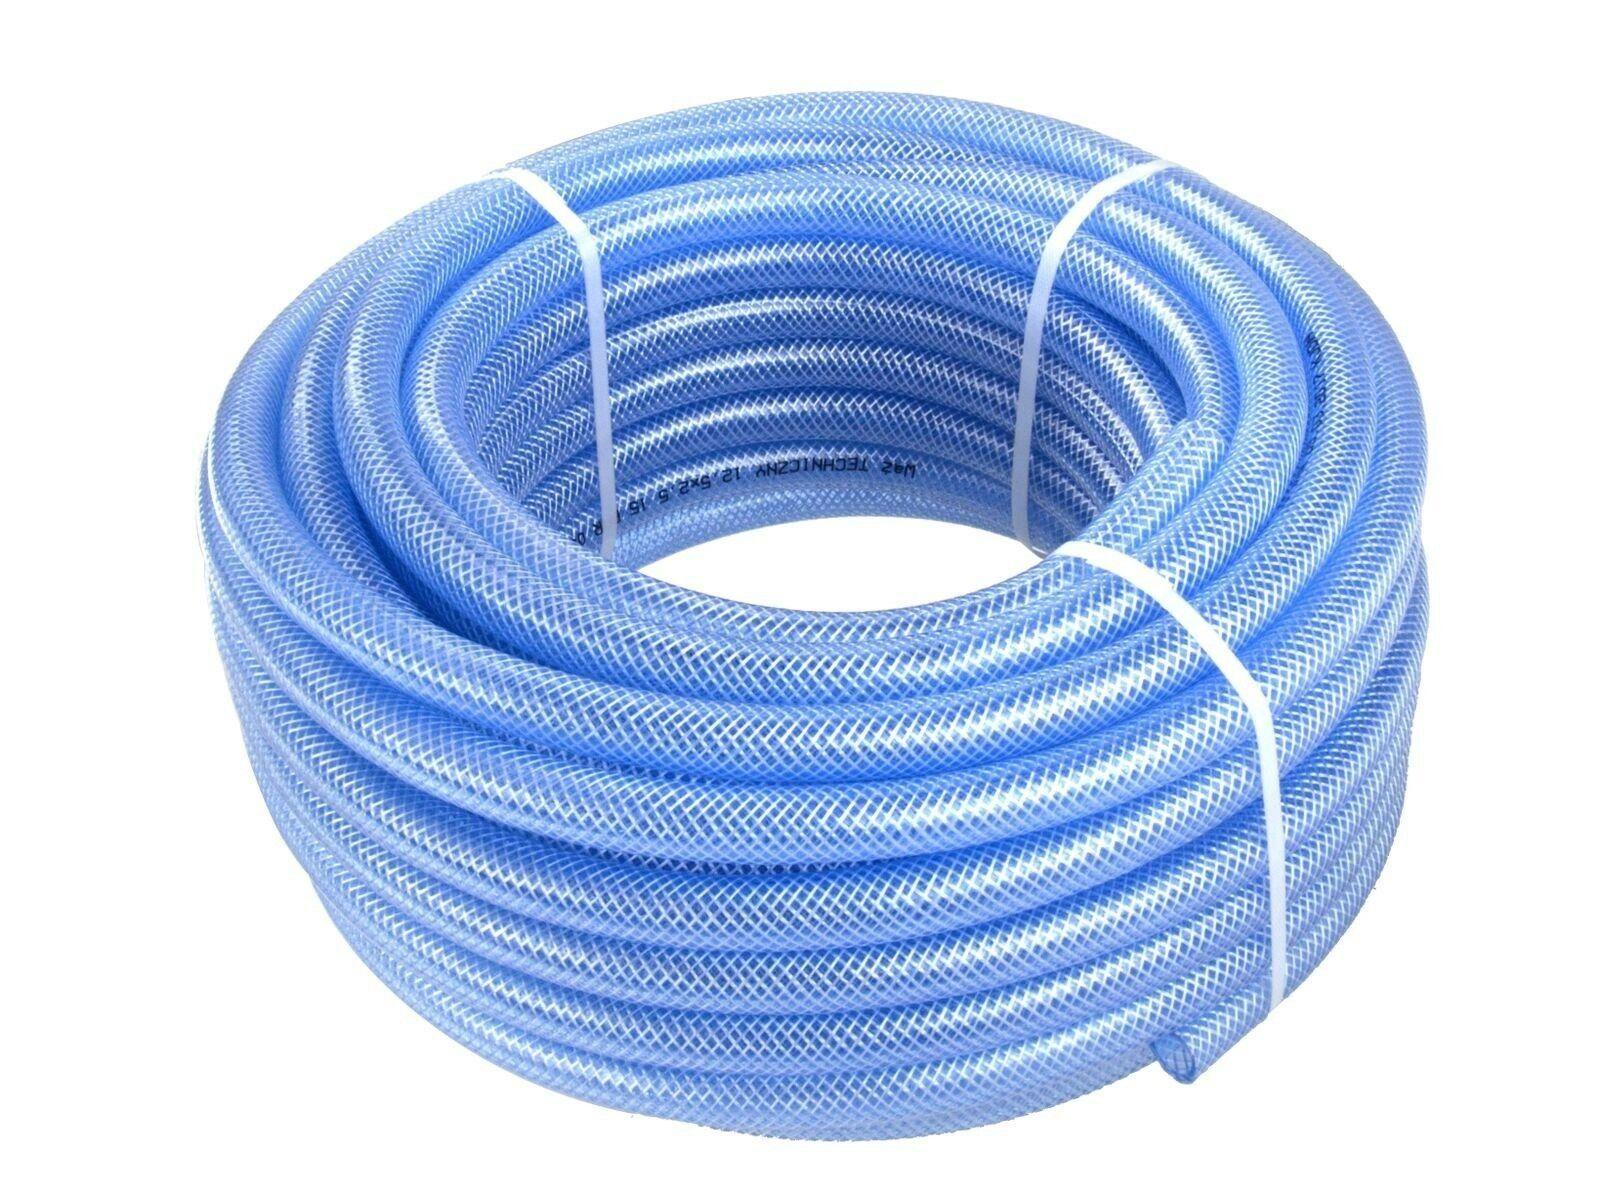 Hadice zesílená modrá, 16x3 mm, 50 m